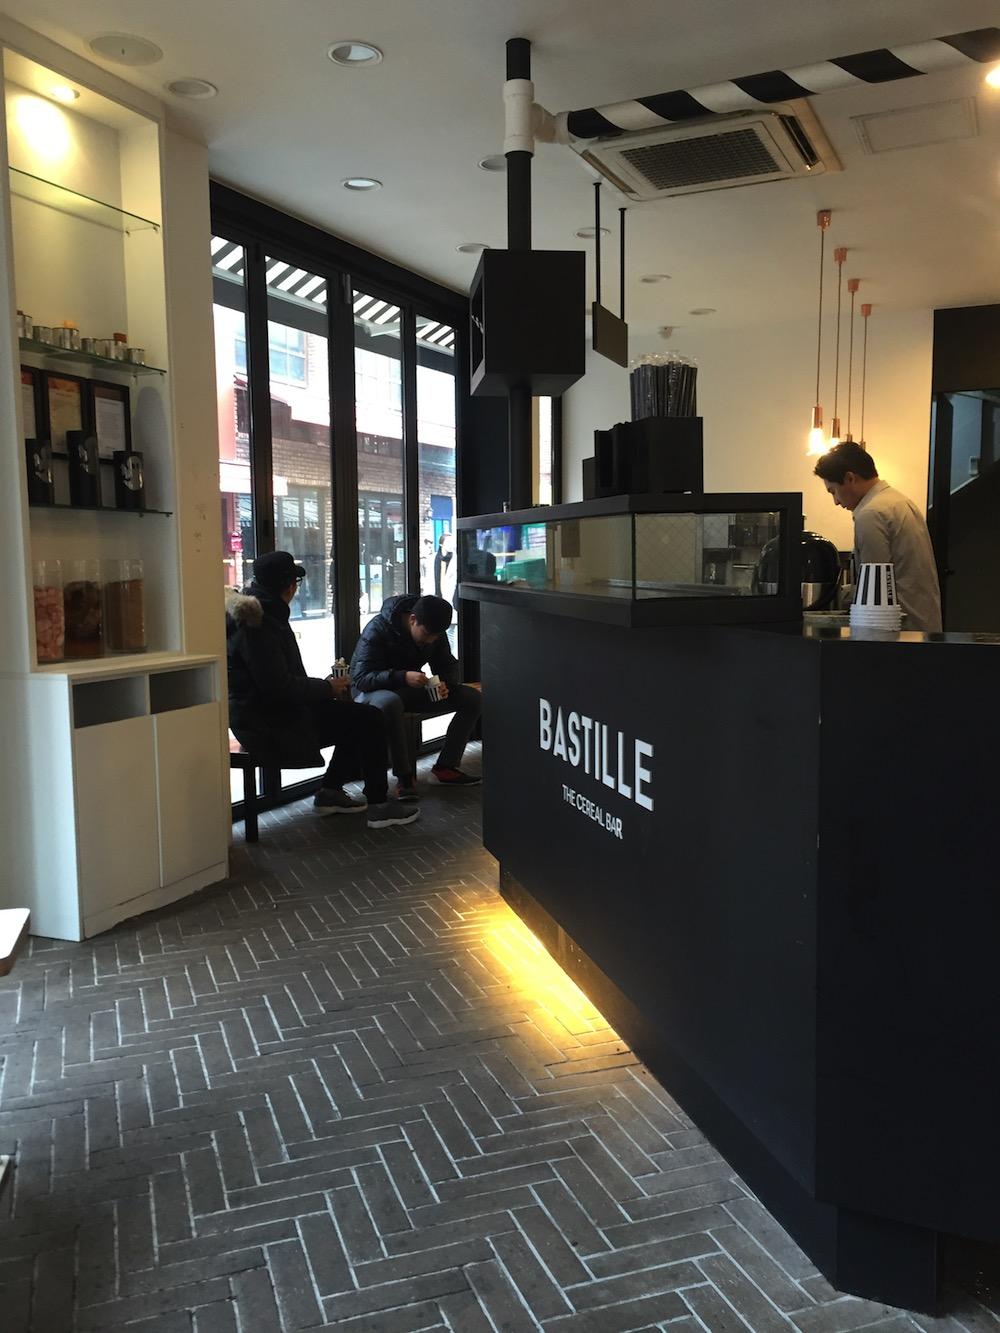 Bastille_1000x1333.JPG